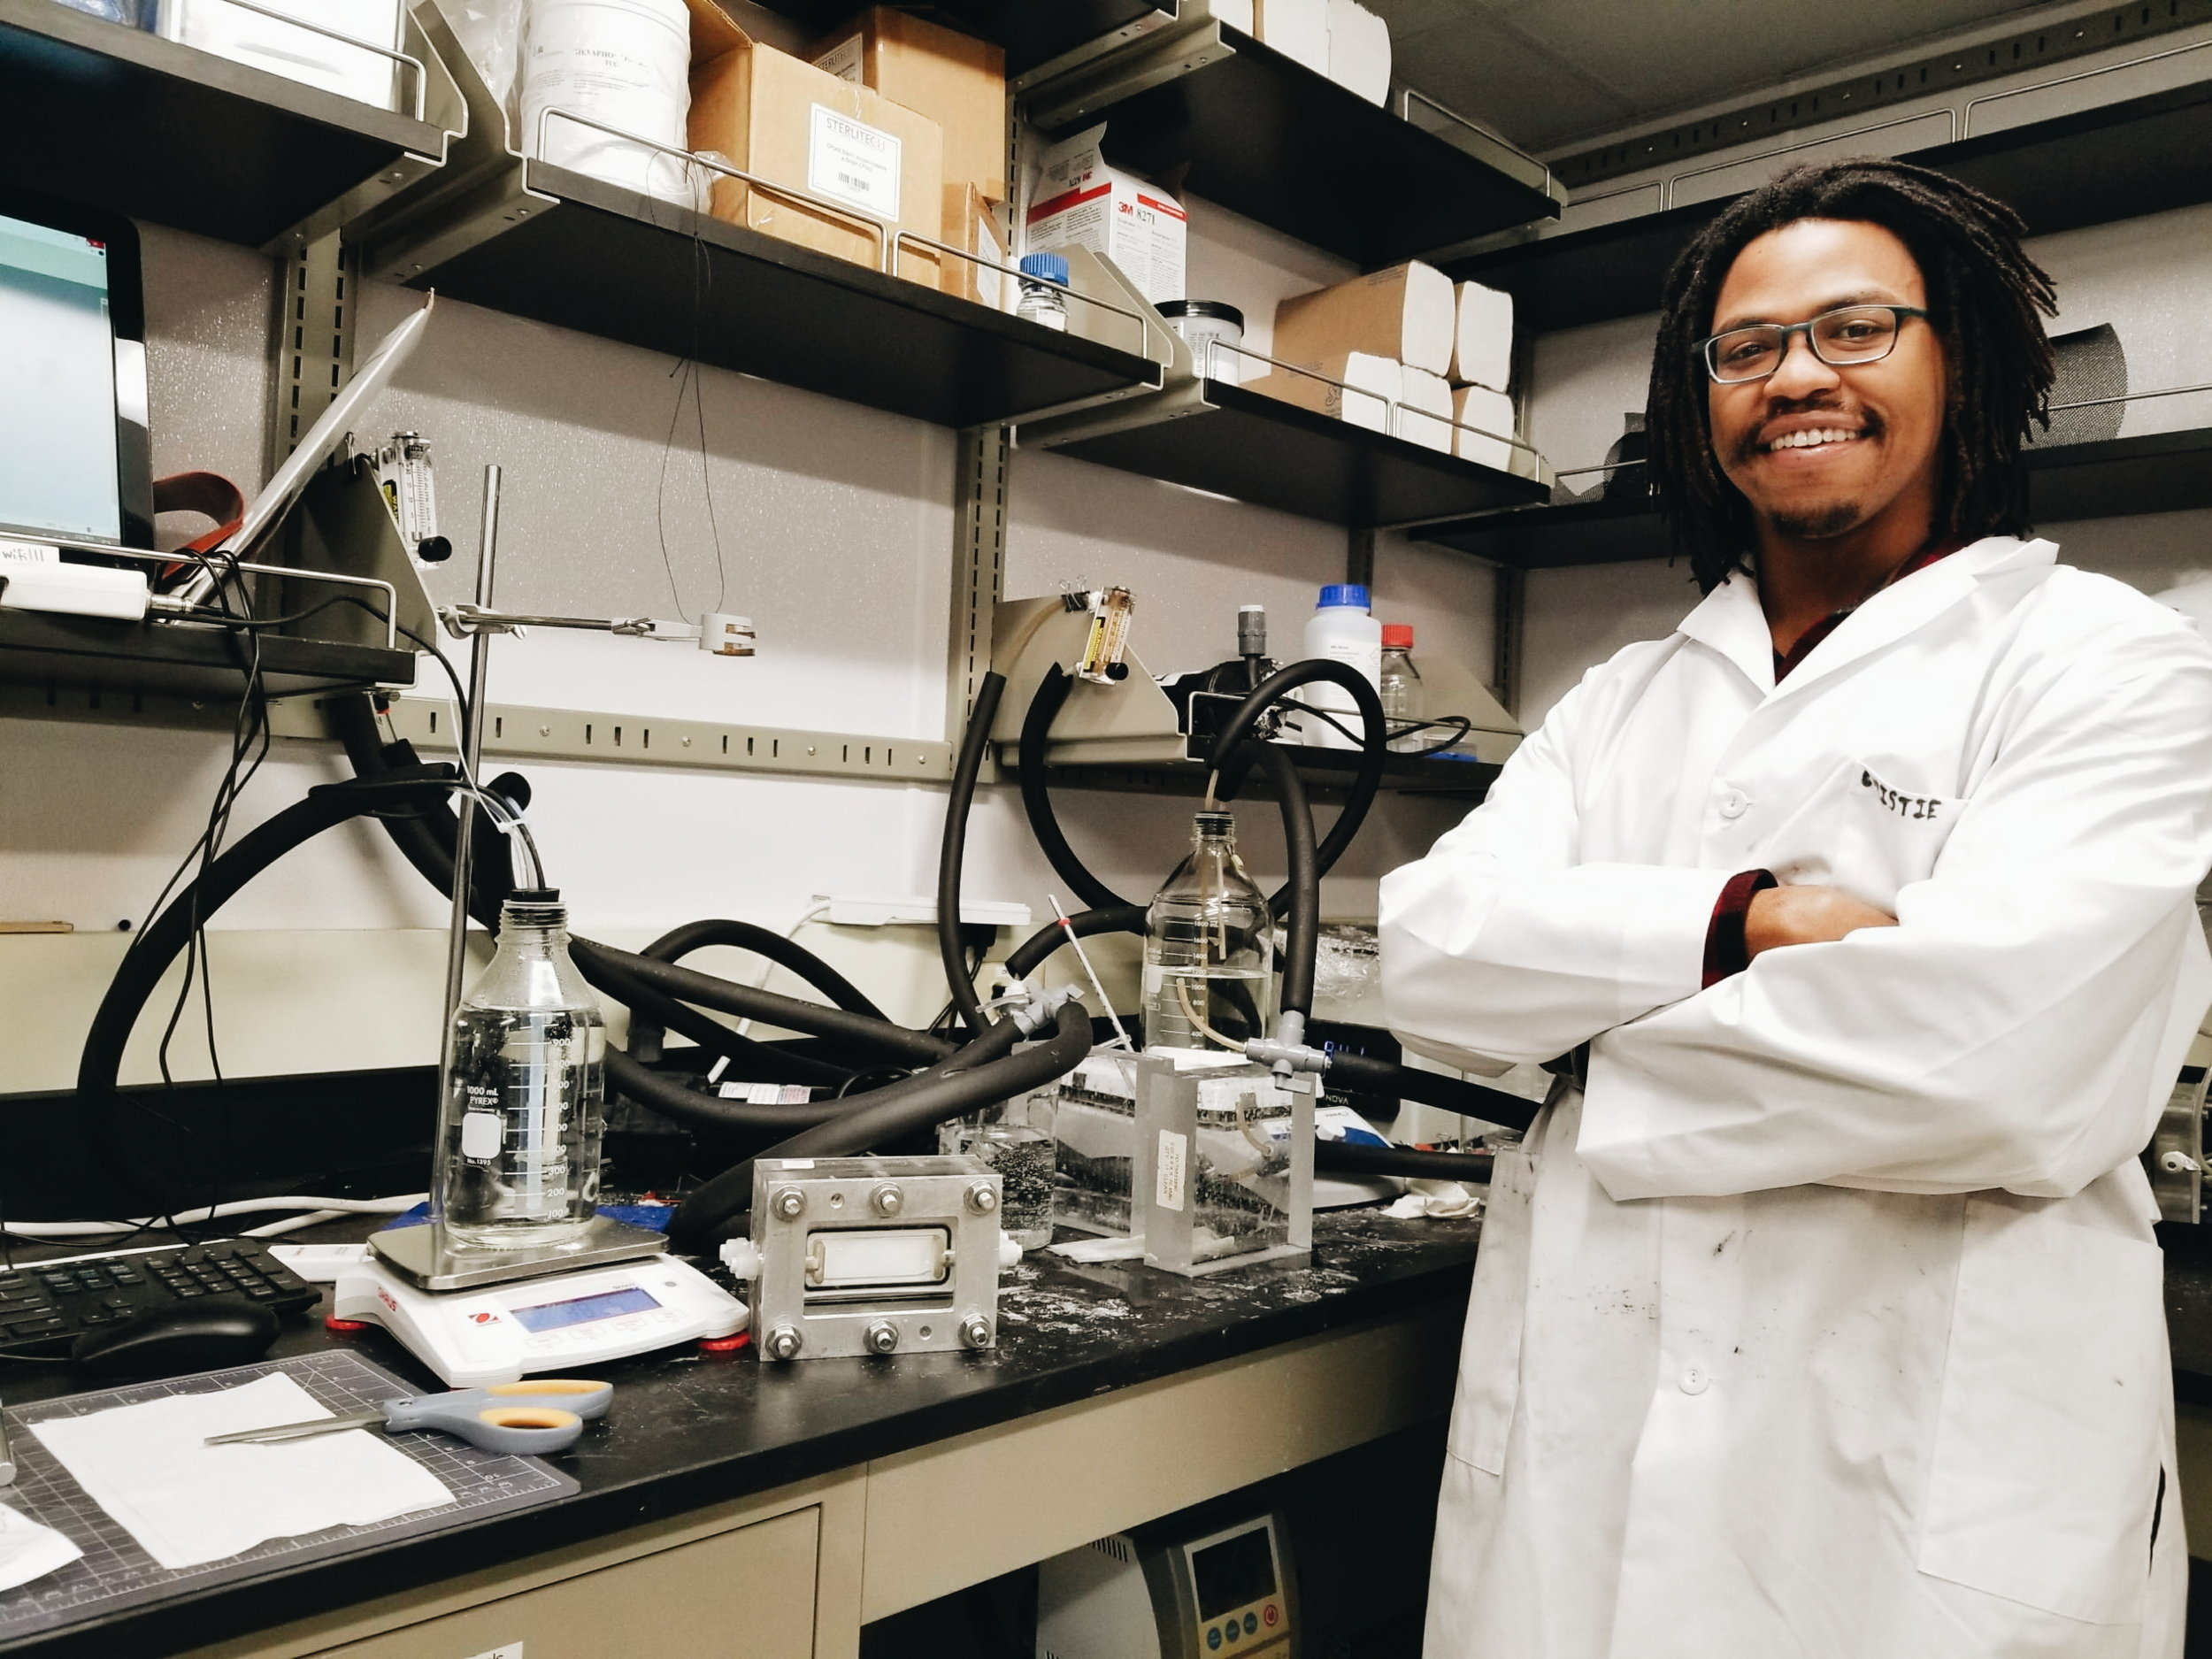 meet this week's pheatured scientist - Phuture Dr. Kofi Christie